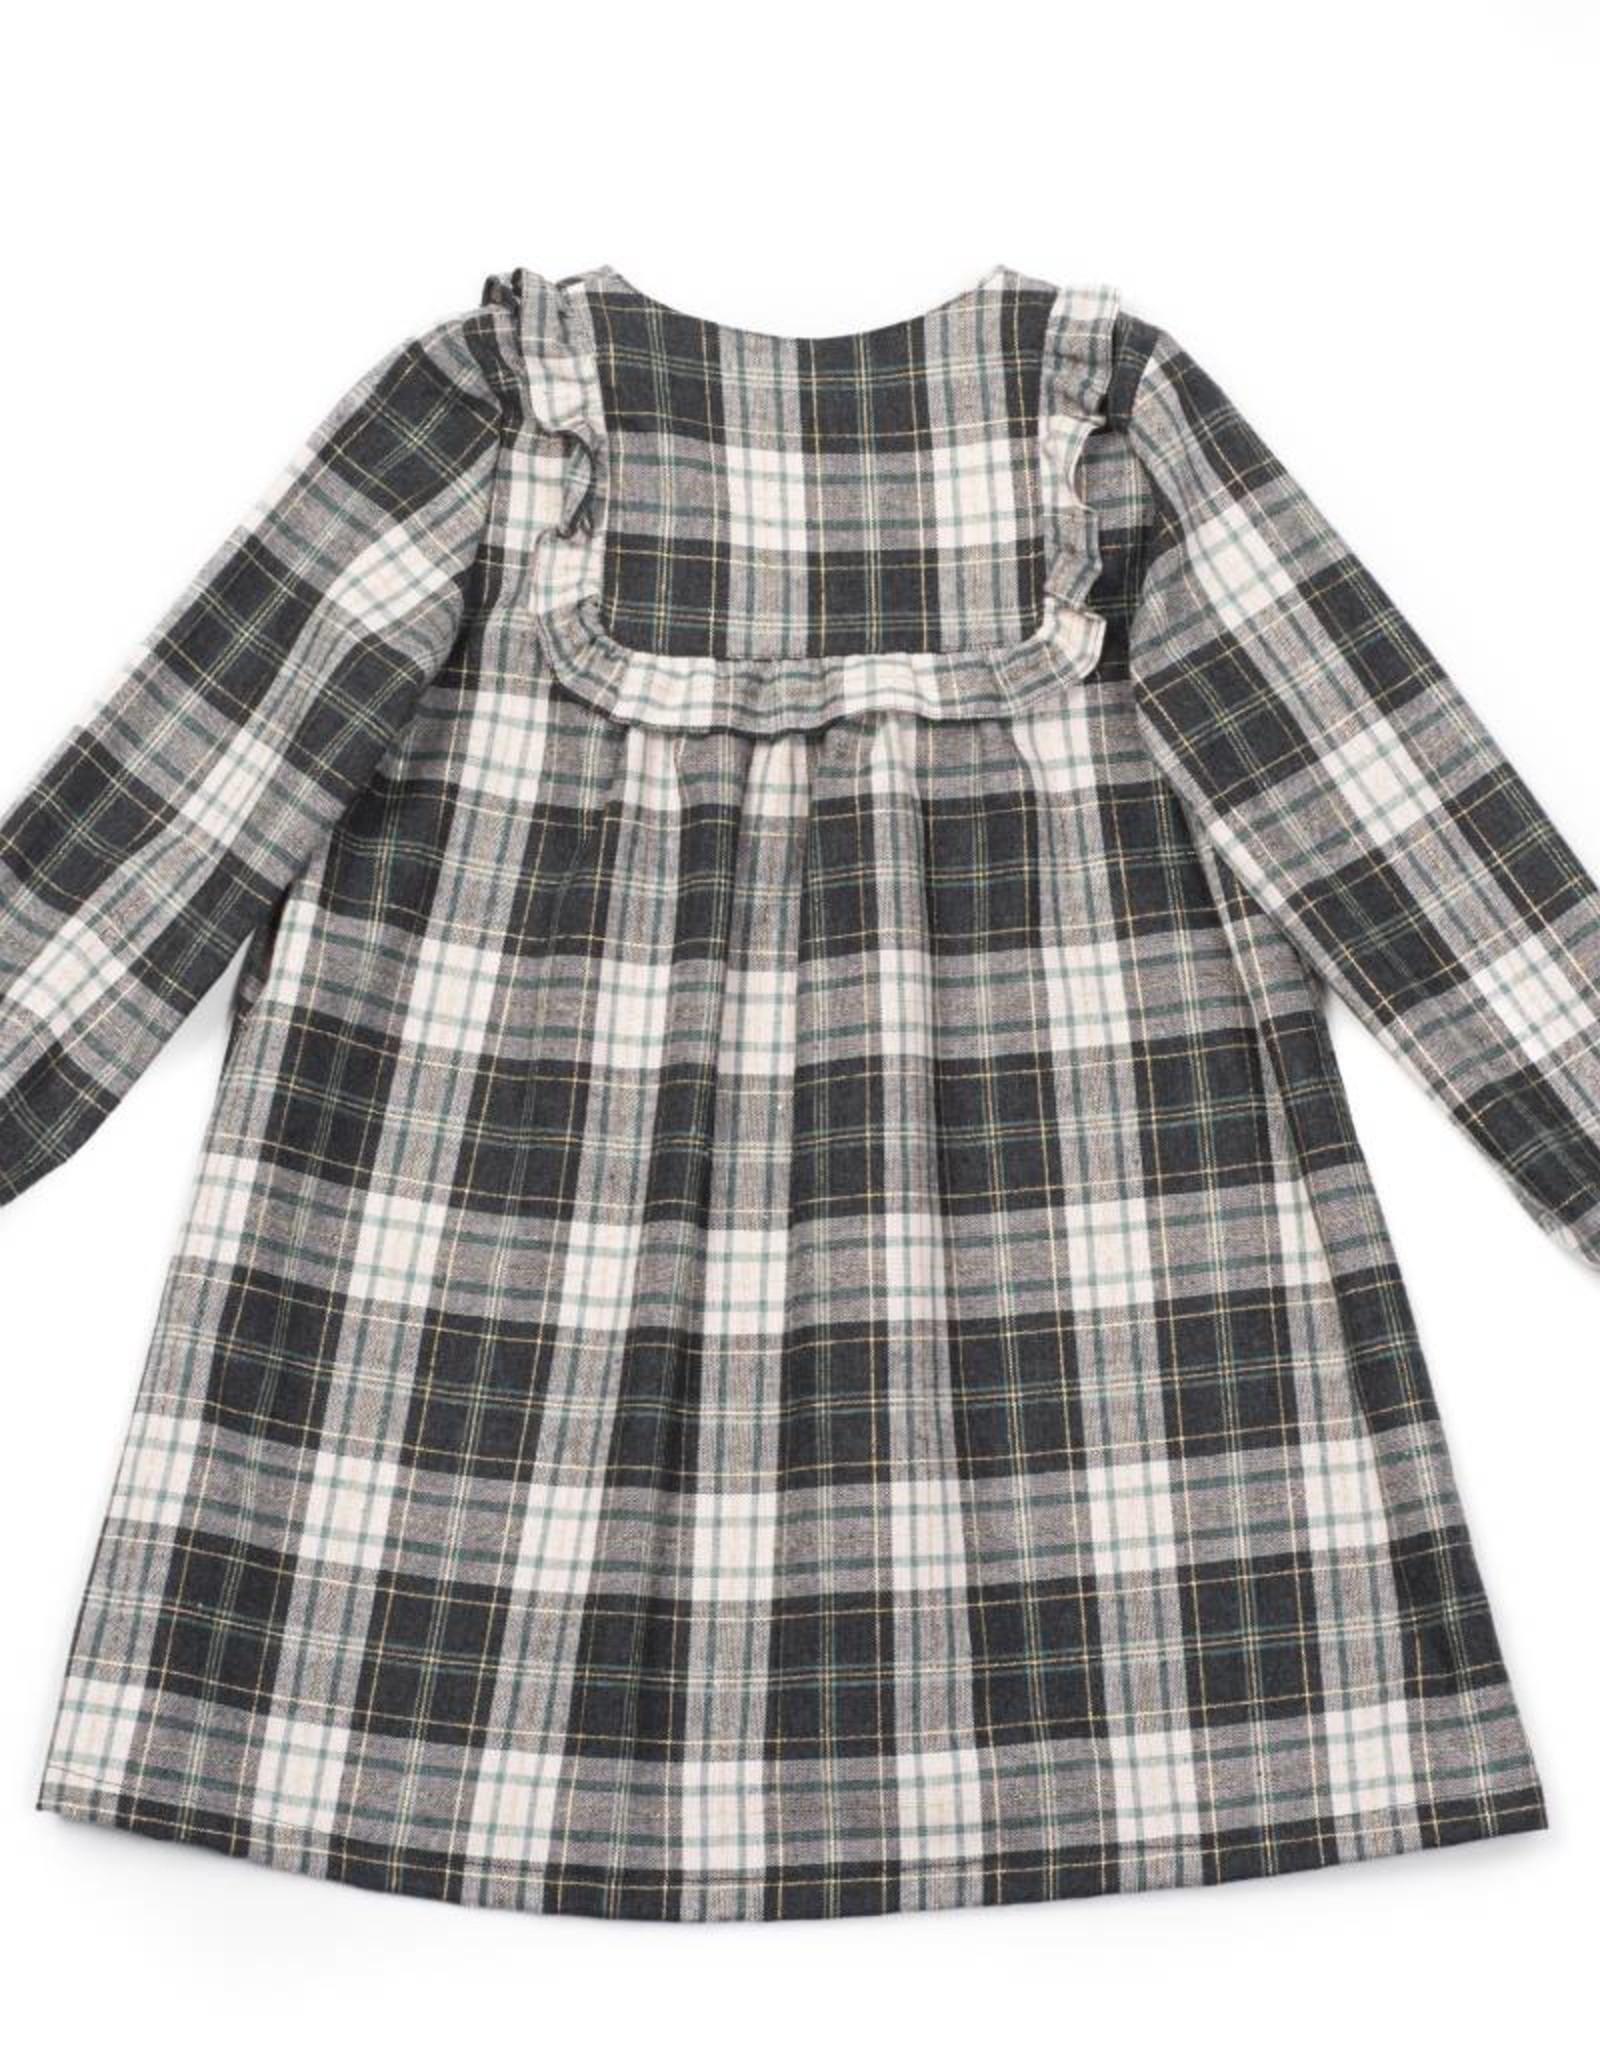 Bonton   Praline dress, Tartan print